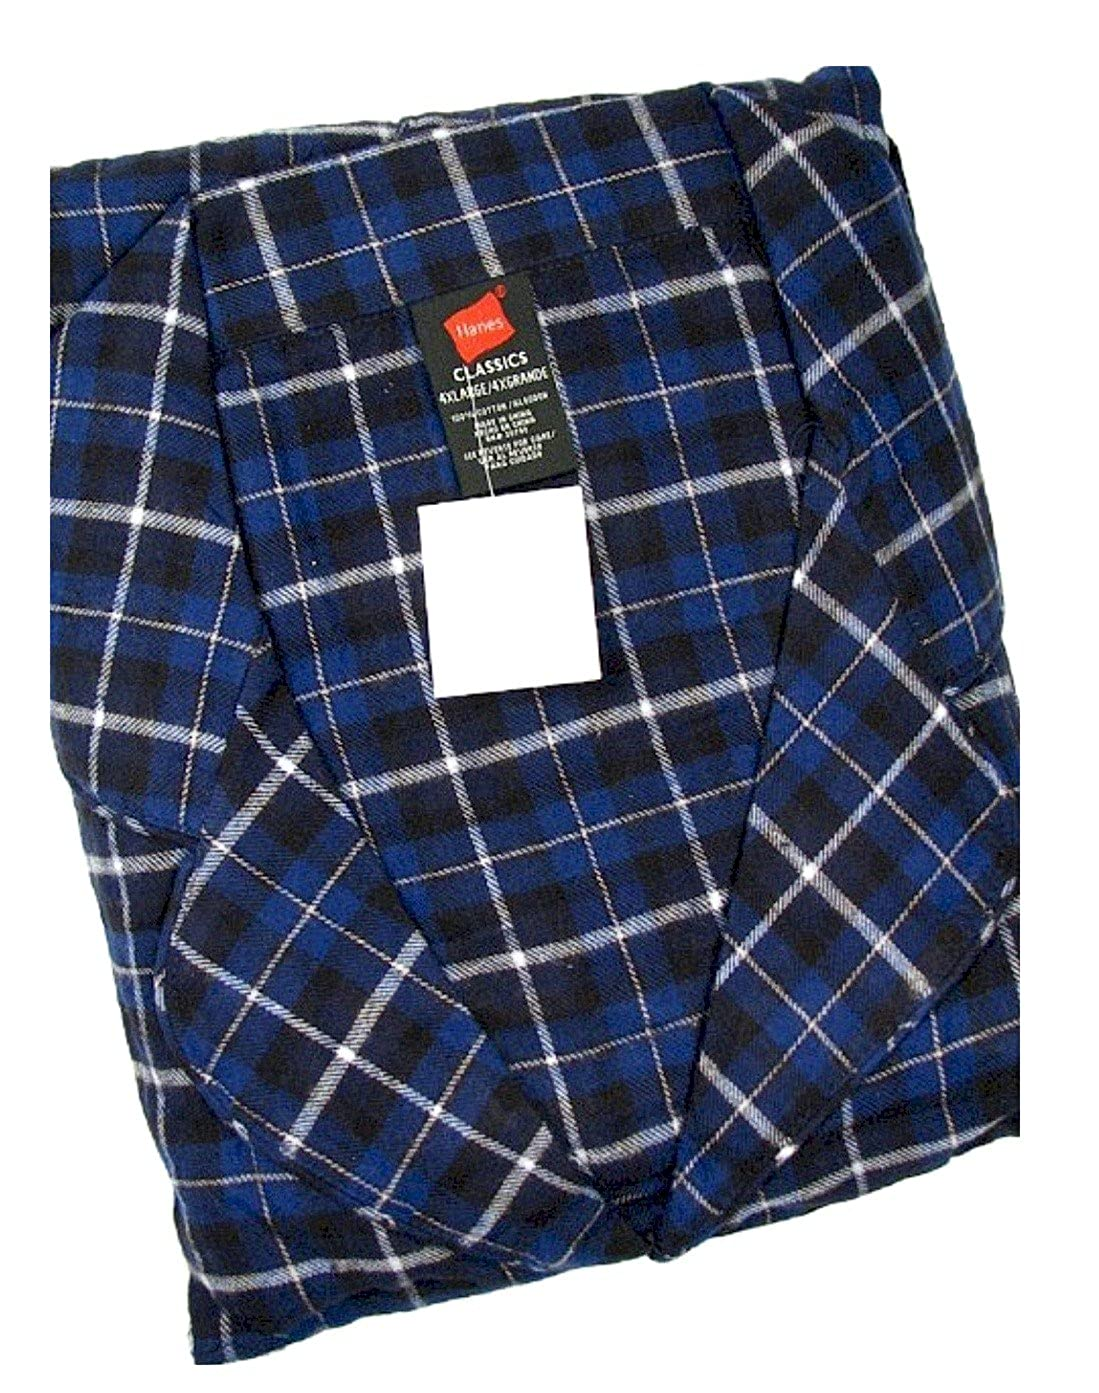 Hanes Classics Big and Tall Flannel Plaid Pajama